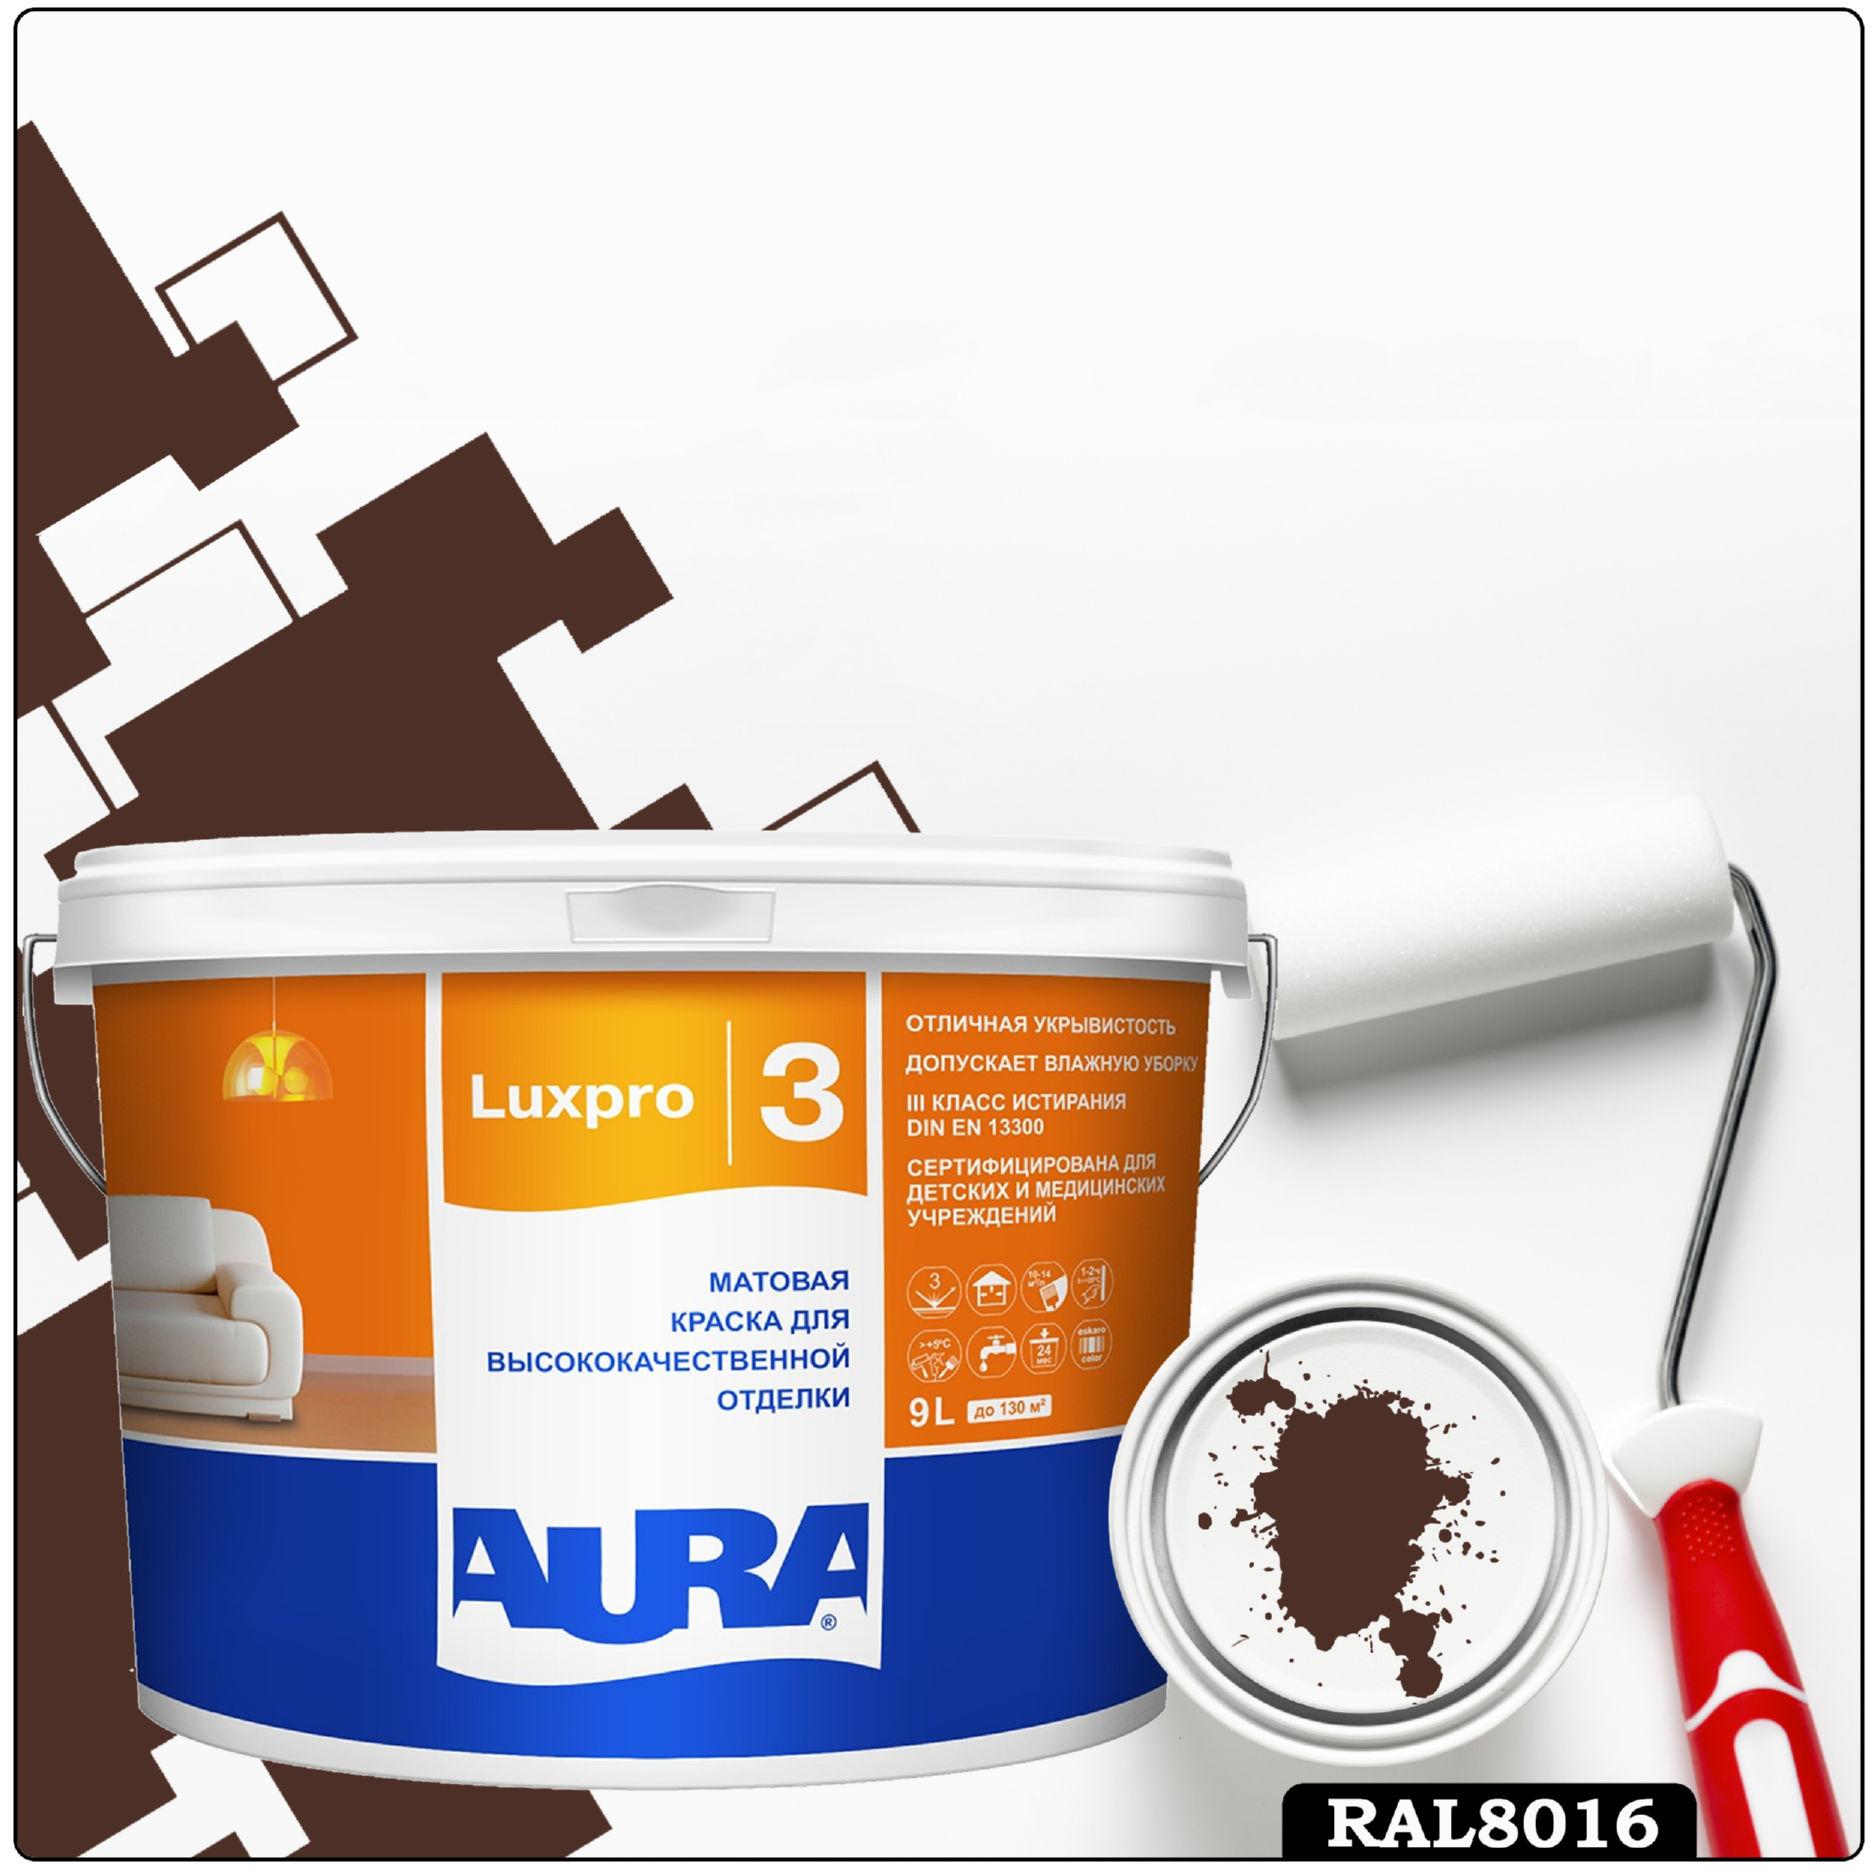 Фото 12 - Краска Aura LuxPRO 3, RAL 8016 Коричневый махагон, латексная, шелково-матовая, интерьерная, 9л, Аура.